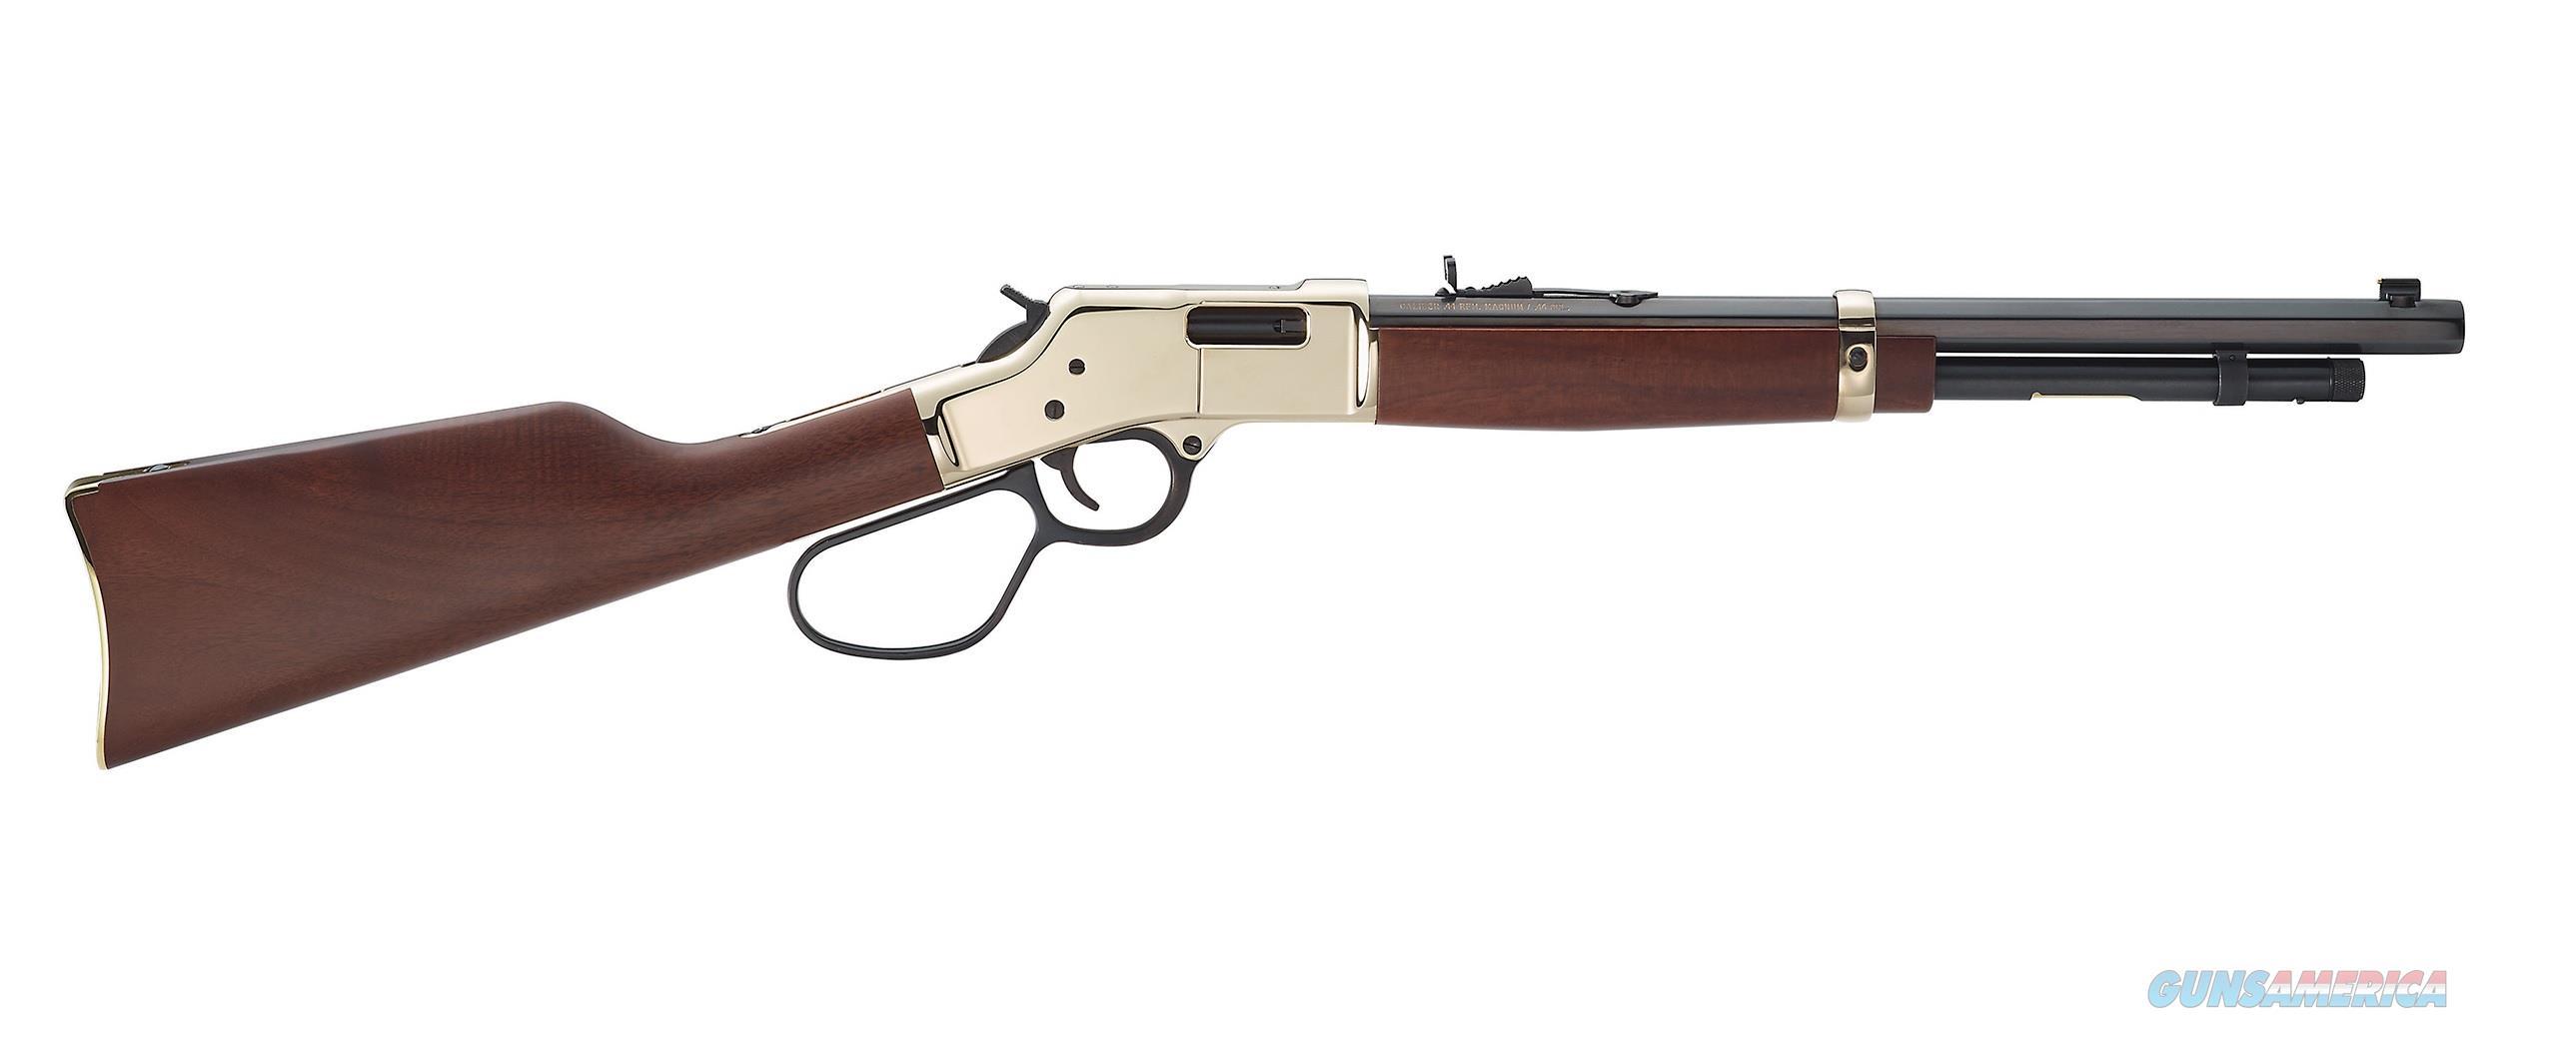 "Henry Big Boy Carbine .357 Magnum/.38 Special 16.5"" H006MR  Guns > Rifles > Henry Rifle Company"